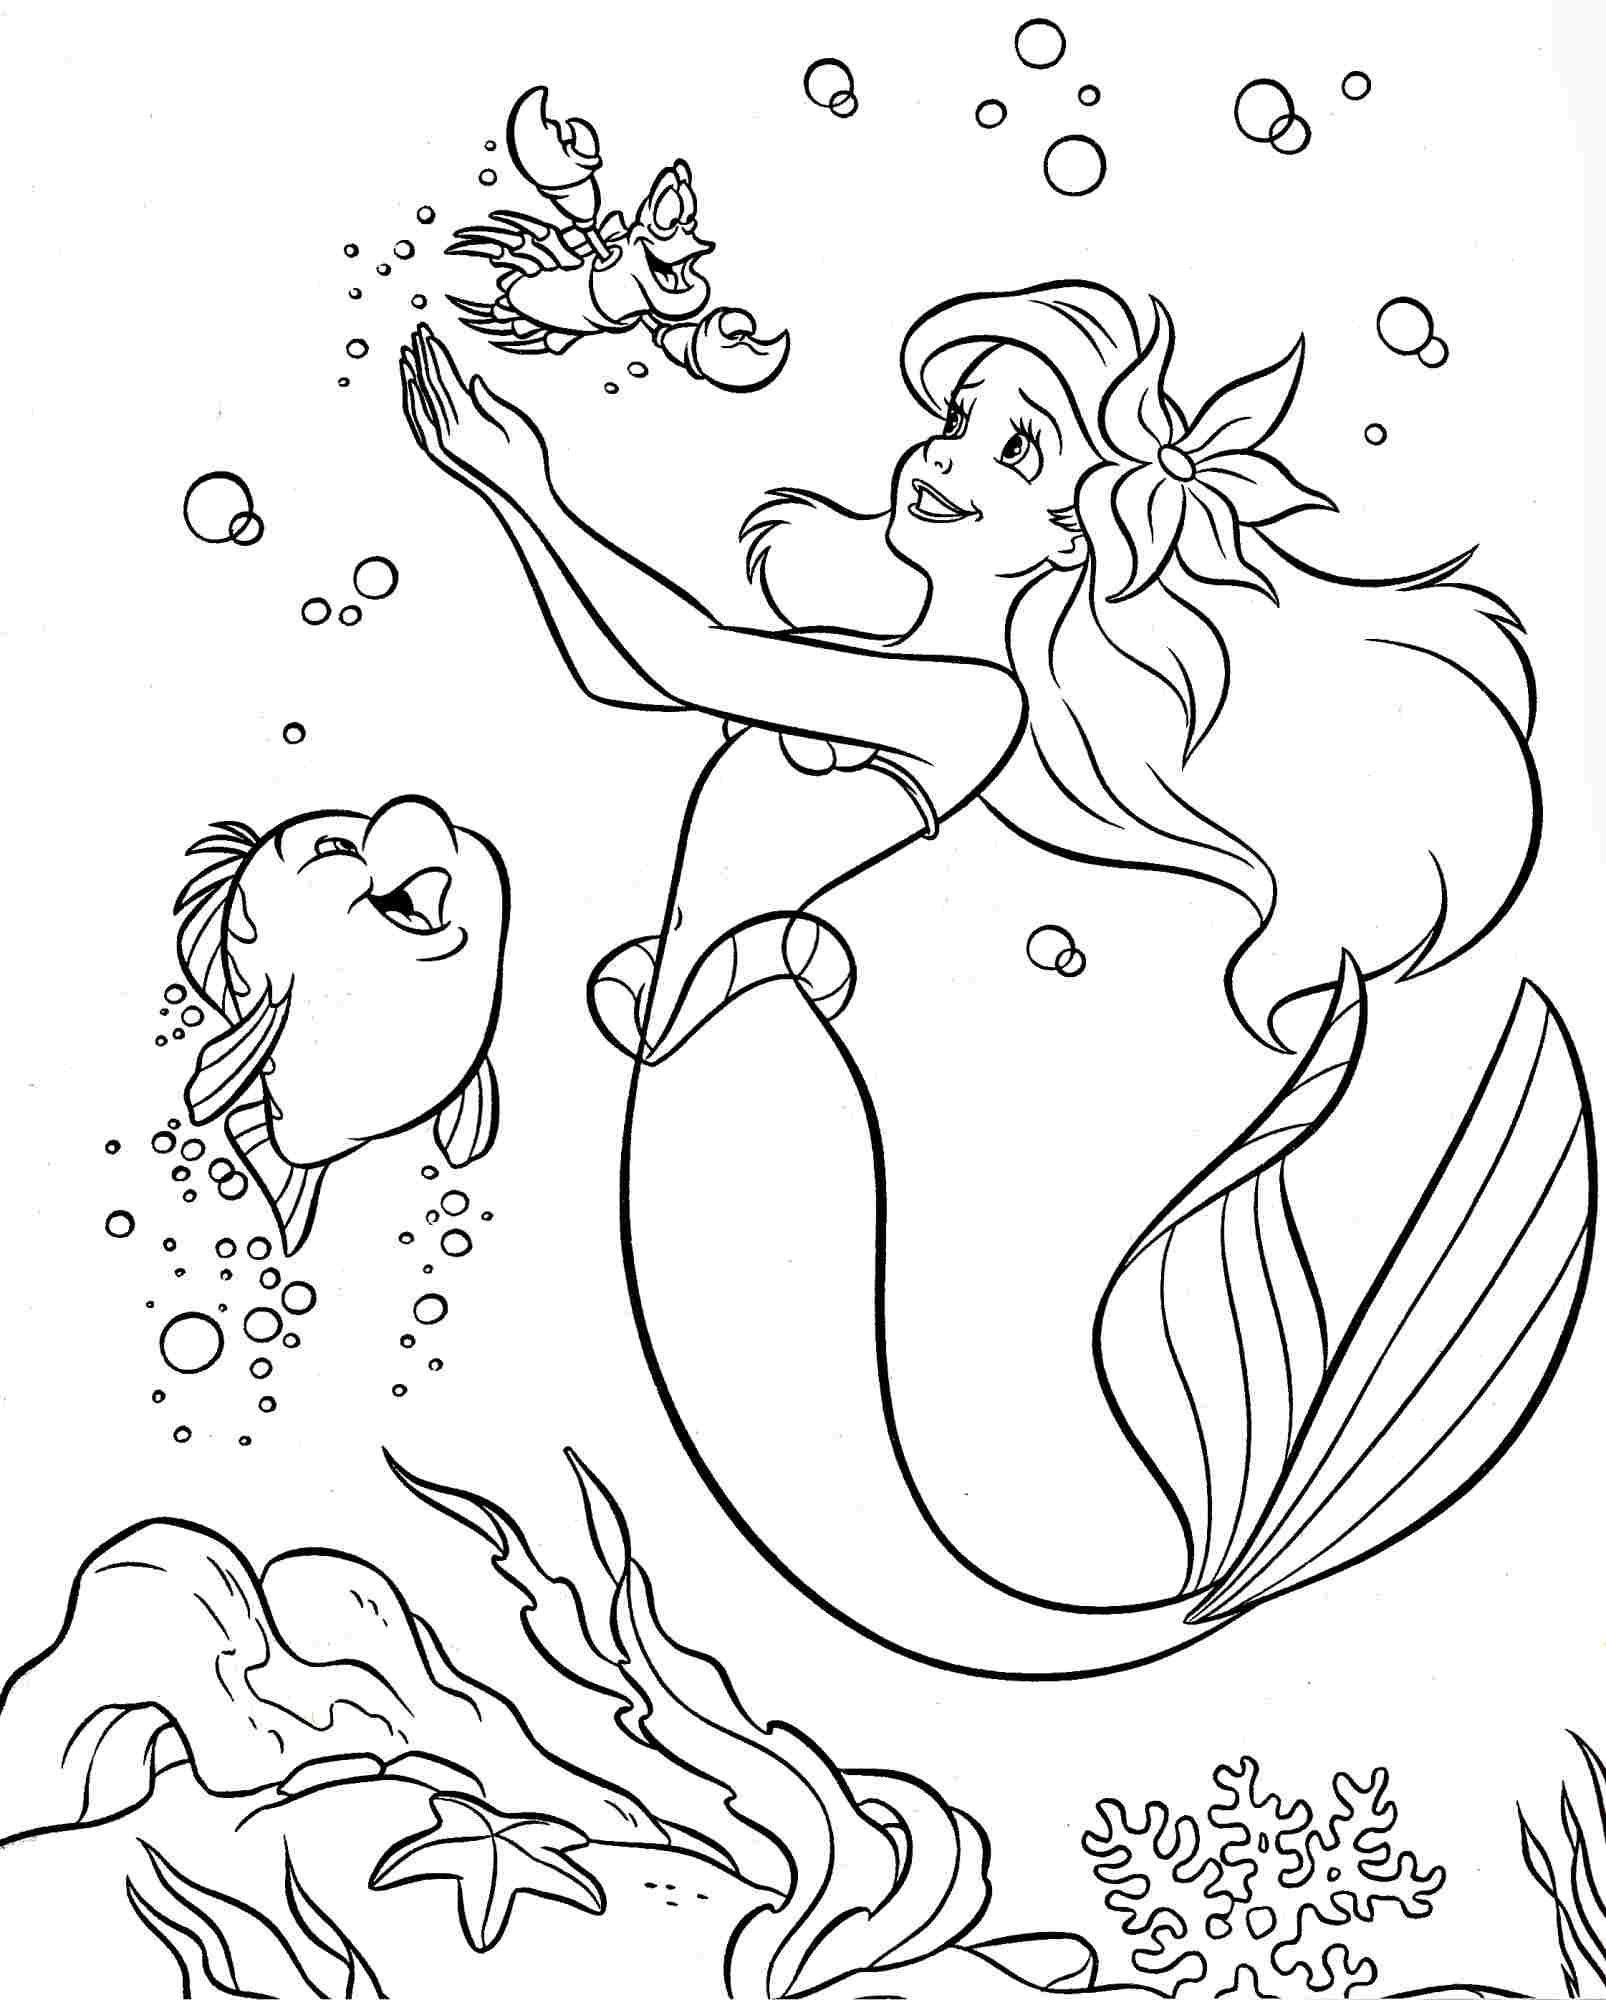 8 Disney Kleurplaten Coloring Pages Ariel Coloring Pages Free Disney Coloring Pages Disney Princess Coloring Pages